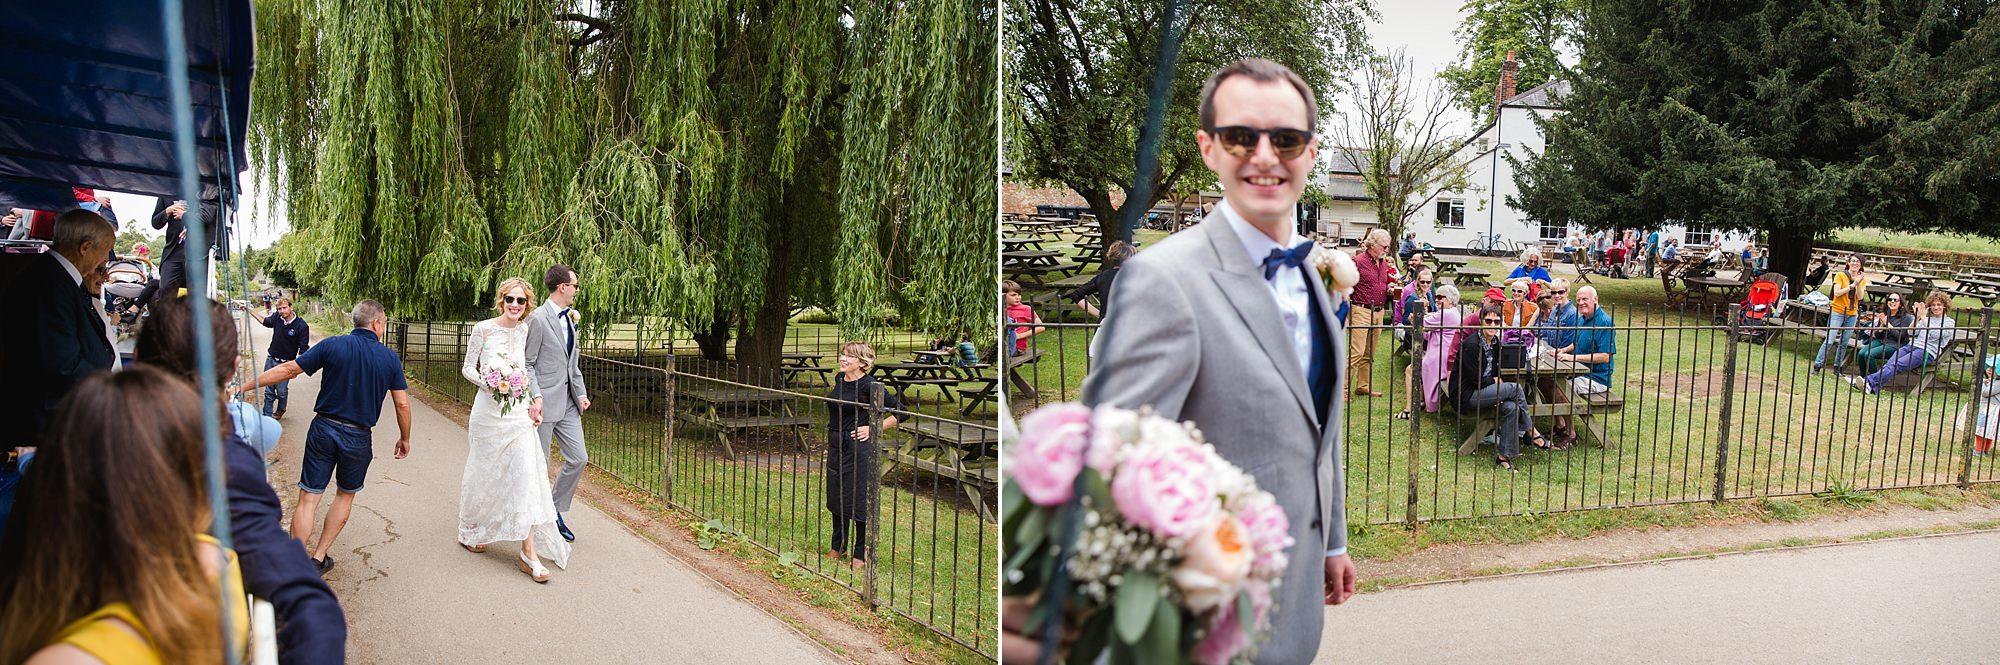 Isis Farmhouse Oxford Wedding bride and groom arrive at isis farmhouse